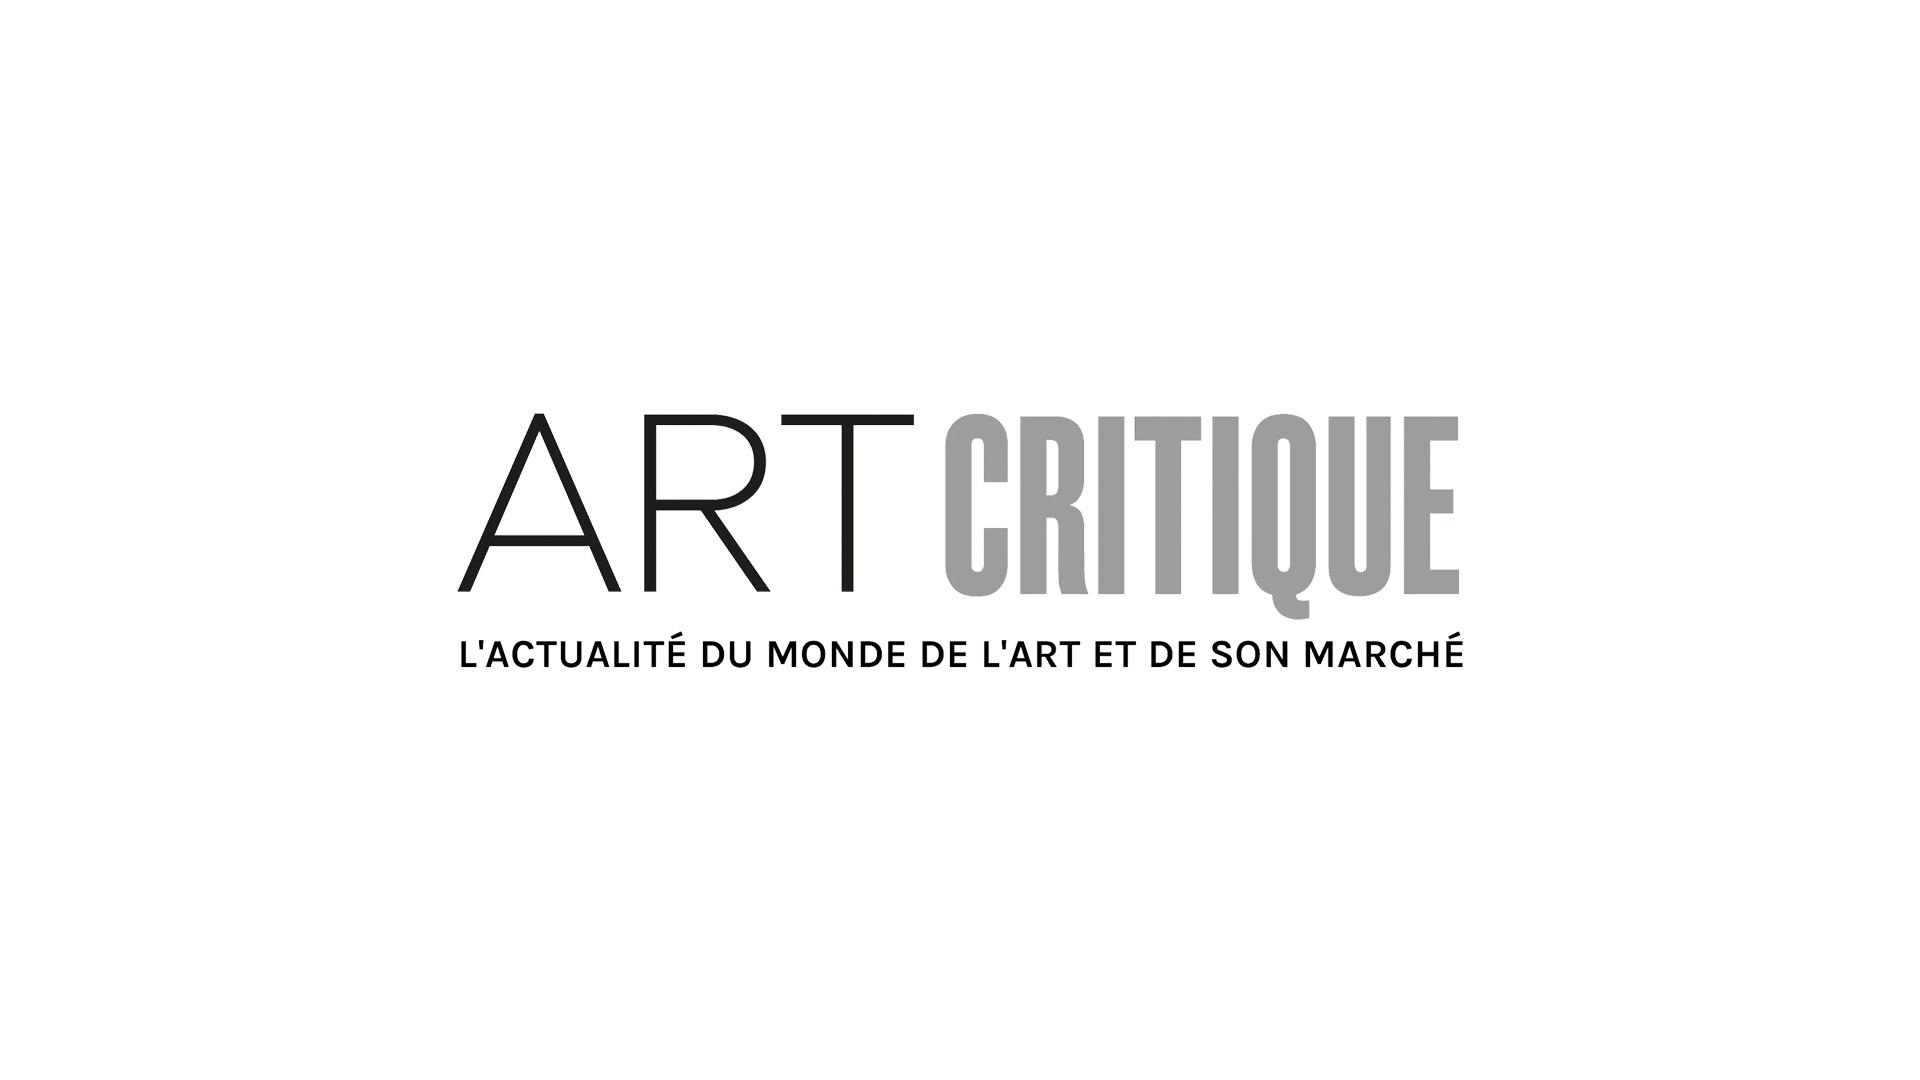 Jean-Baptiste Marot : «la peinture est un art martial».